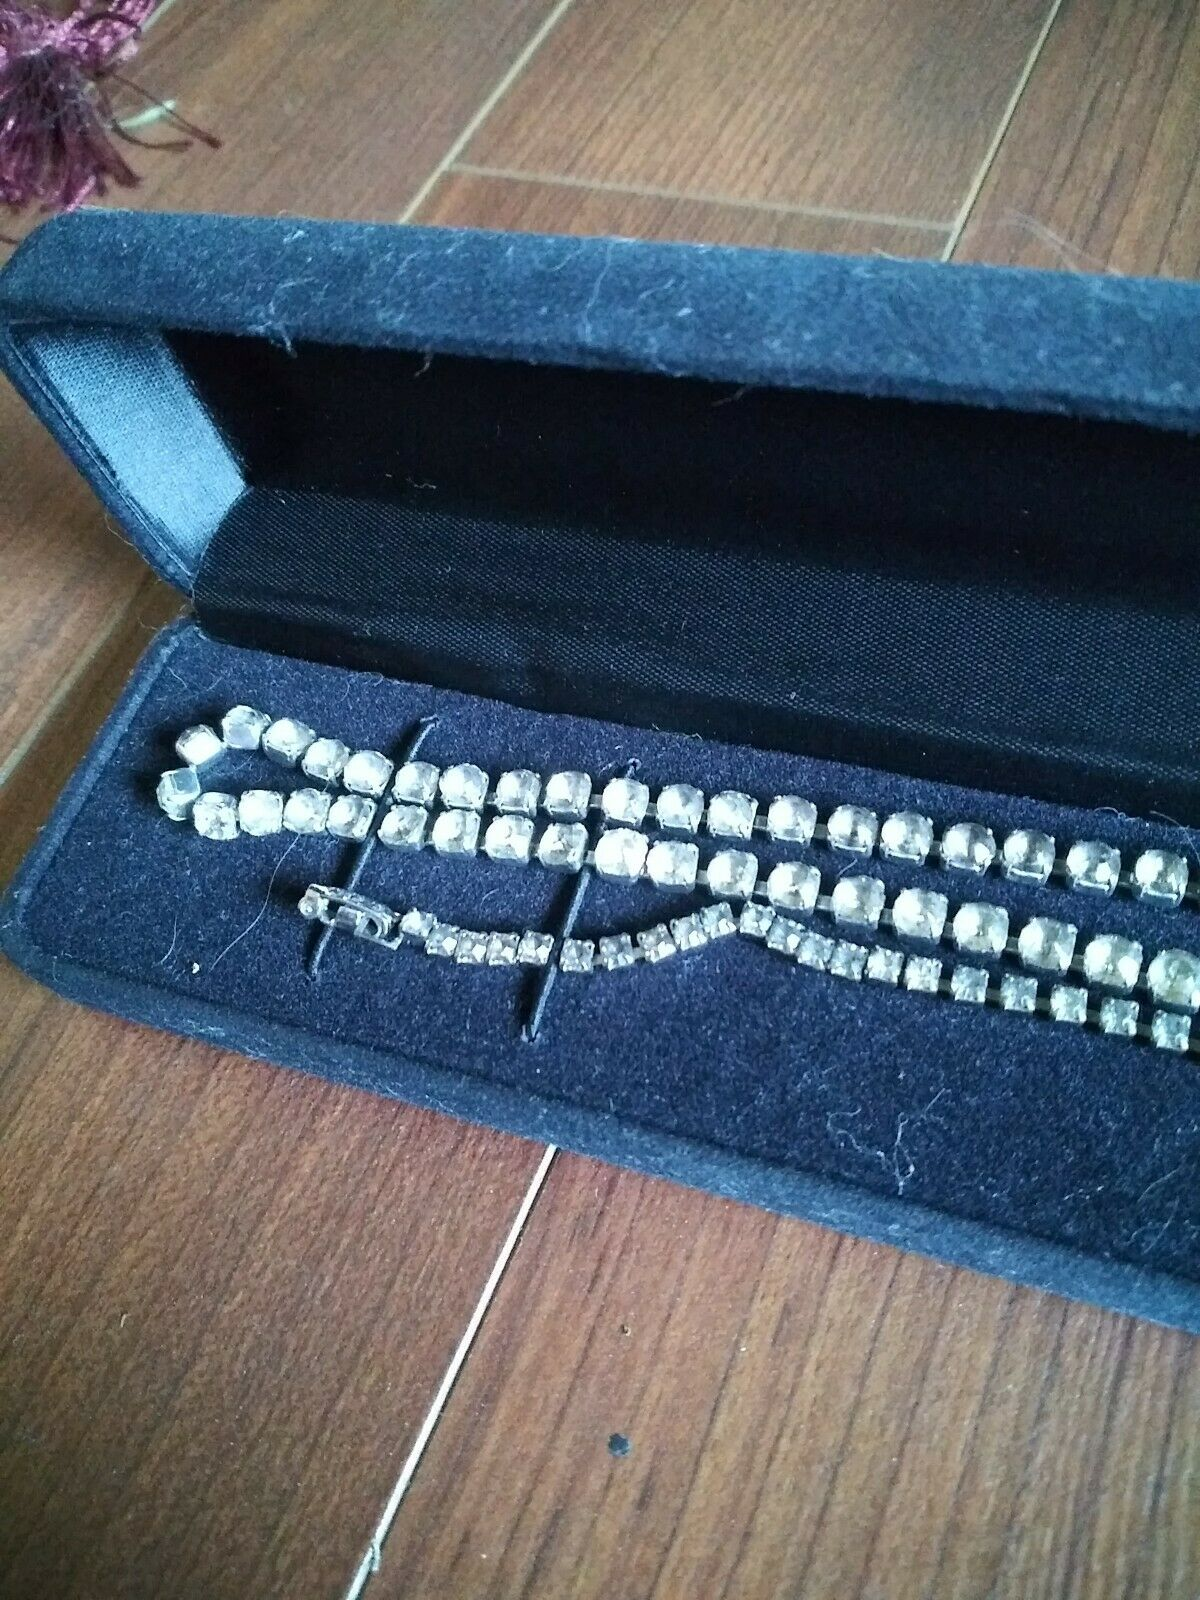 Costume Diamond Necklace And Bracelet Lot - image 2